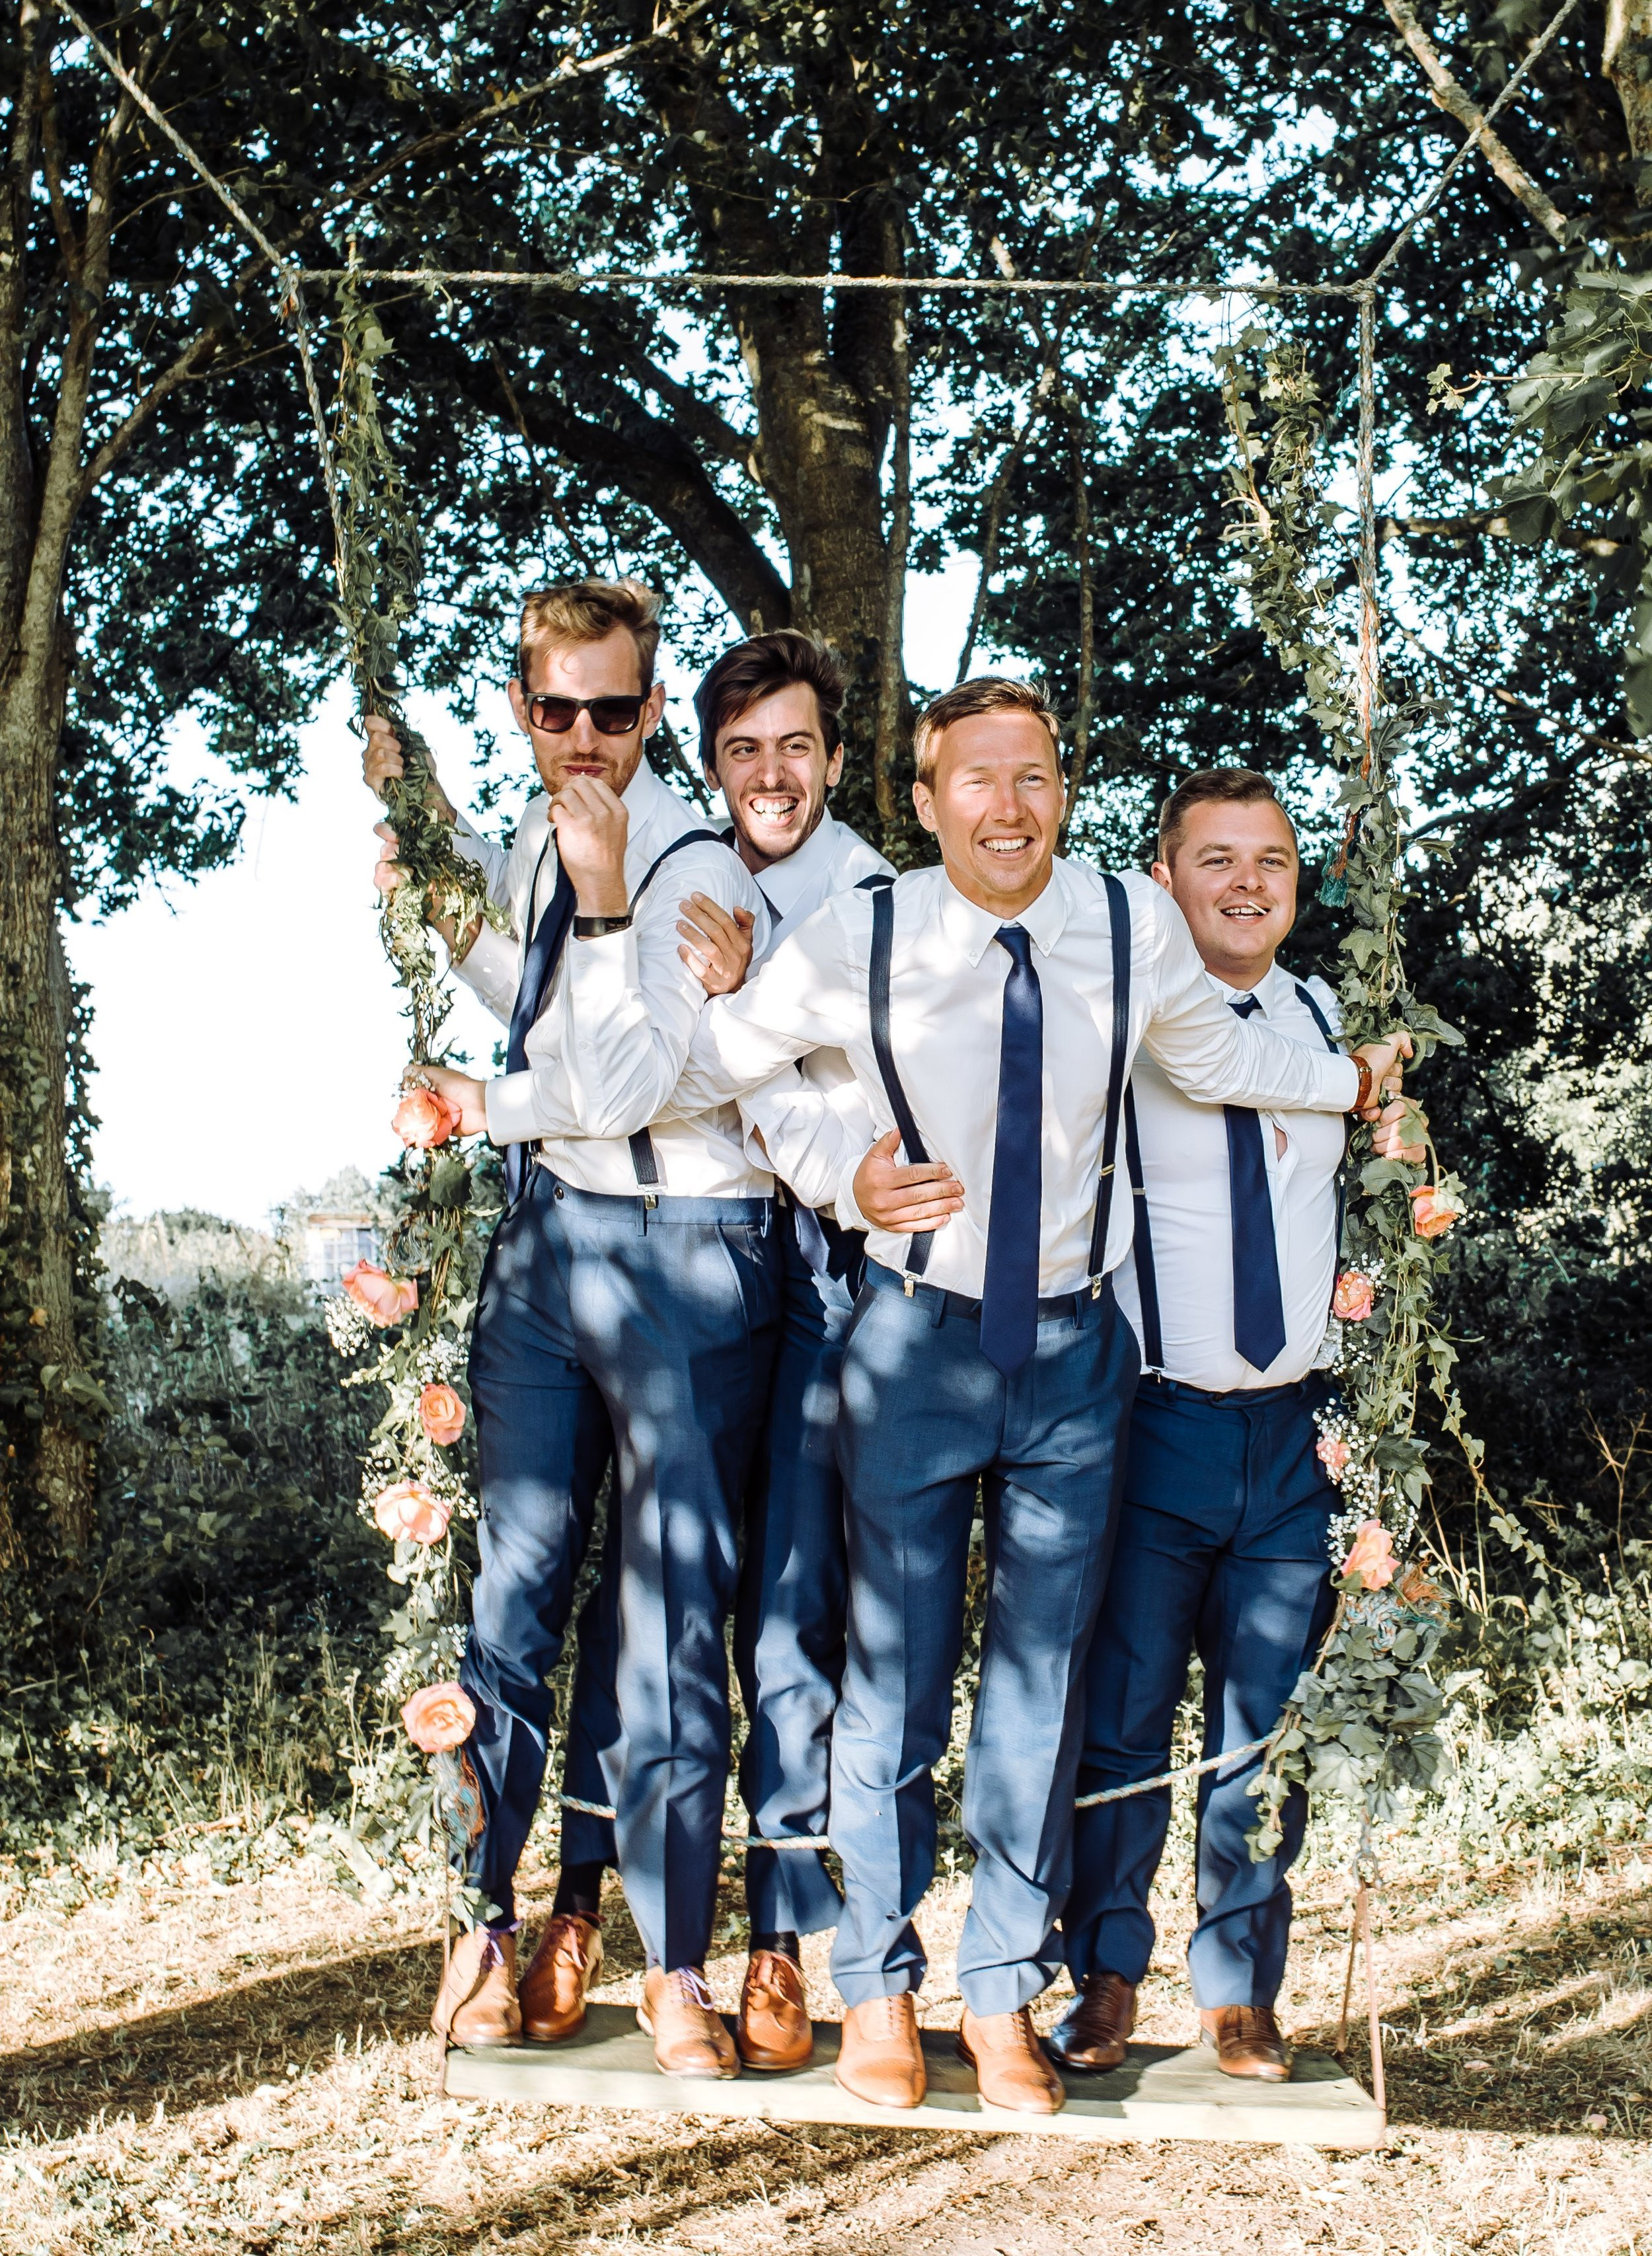 Vintage Wedding - East Sussex Wedding Photographer_0040.jpg